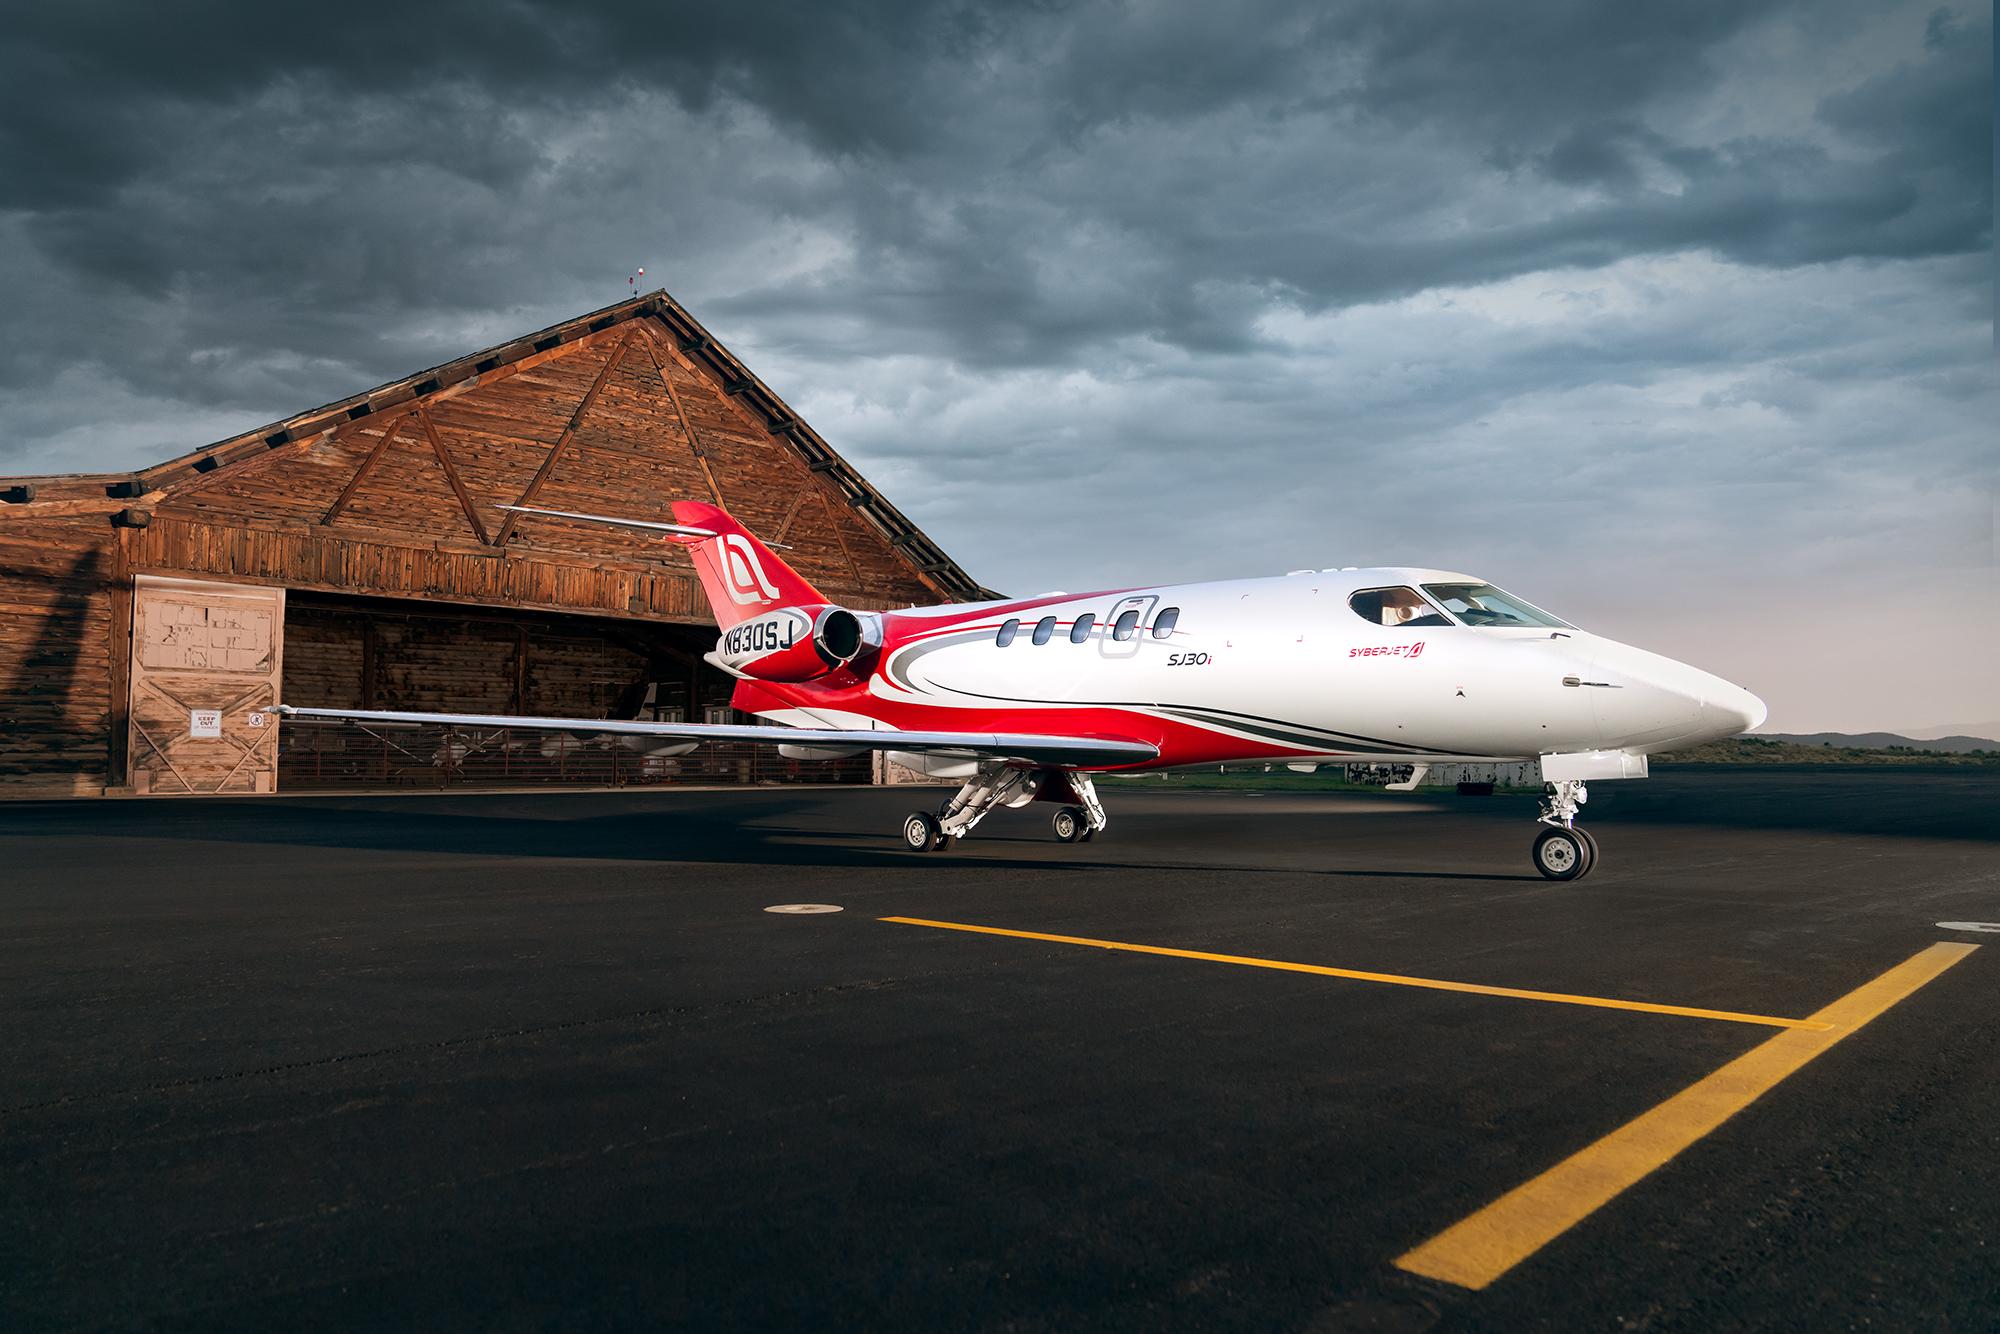 Stormy Jet Hangar